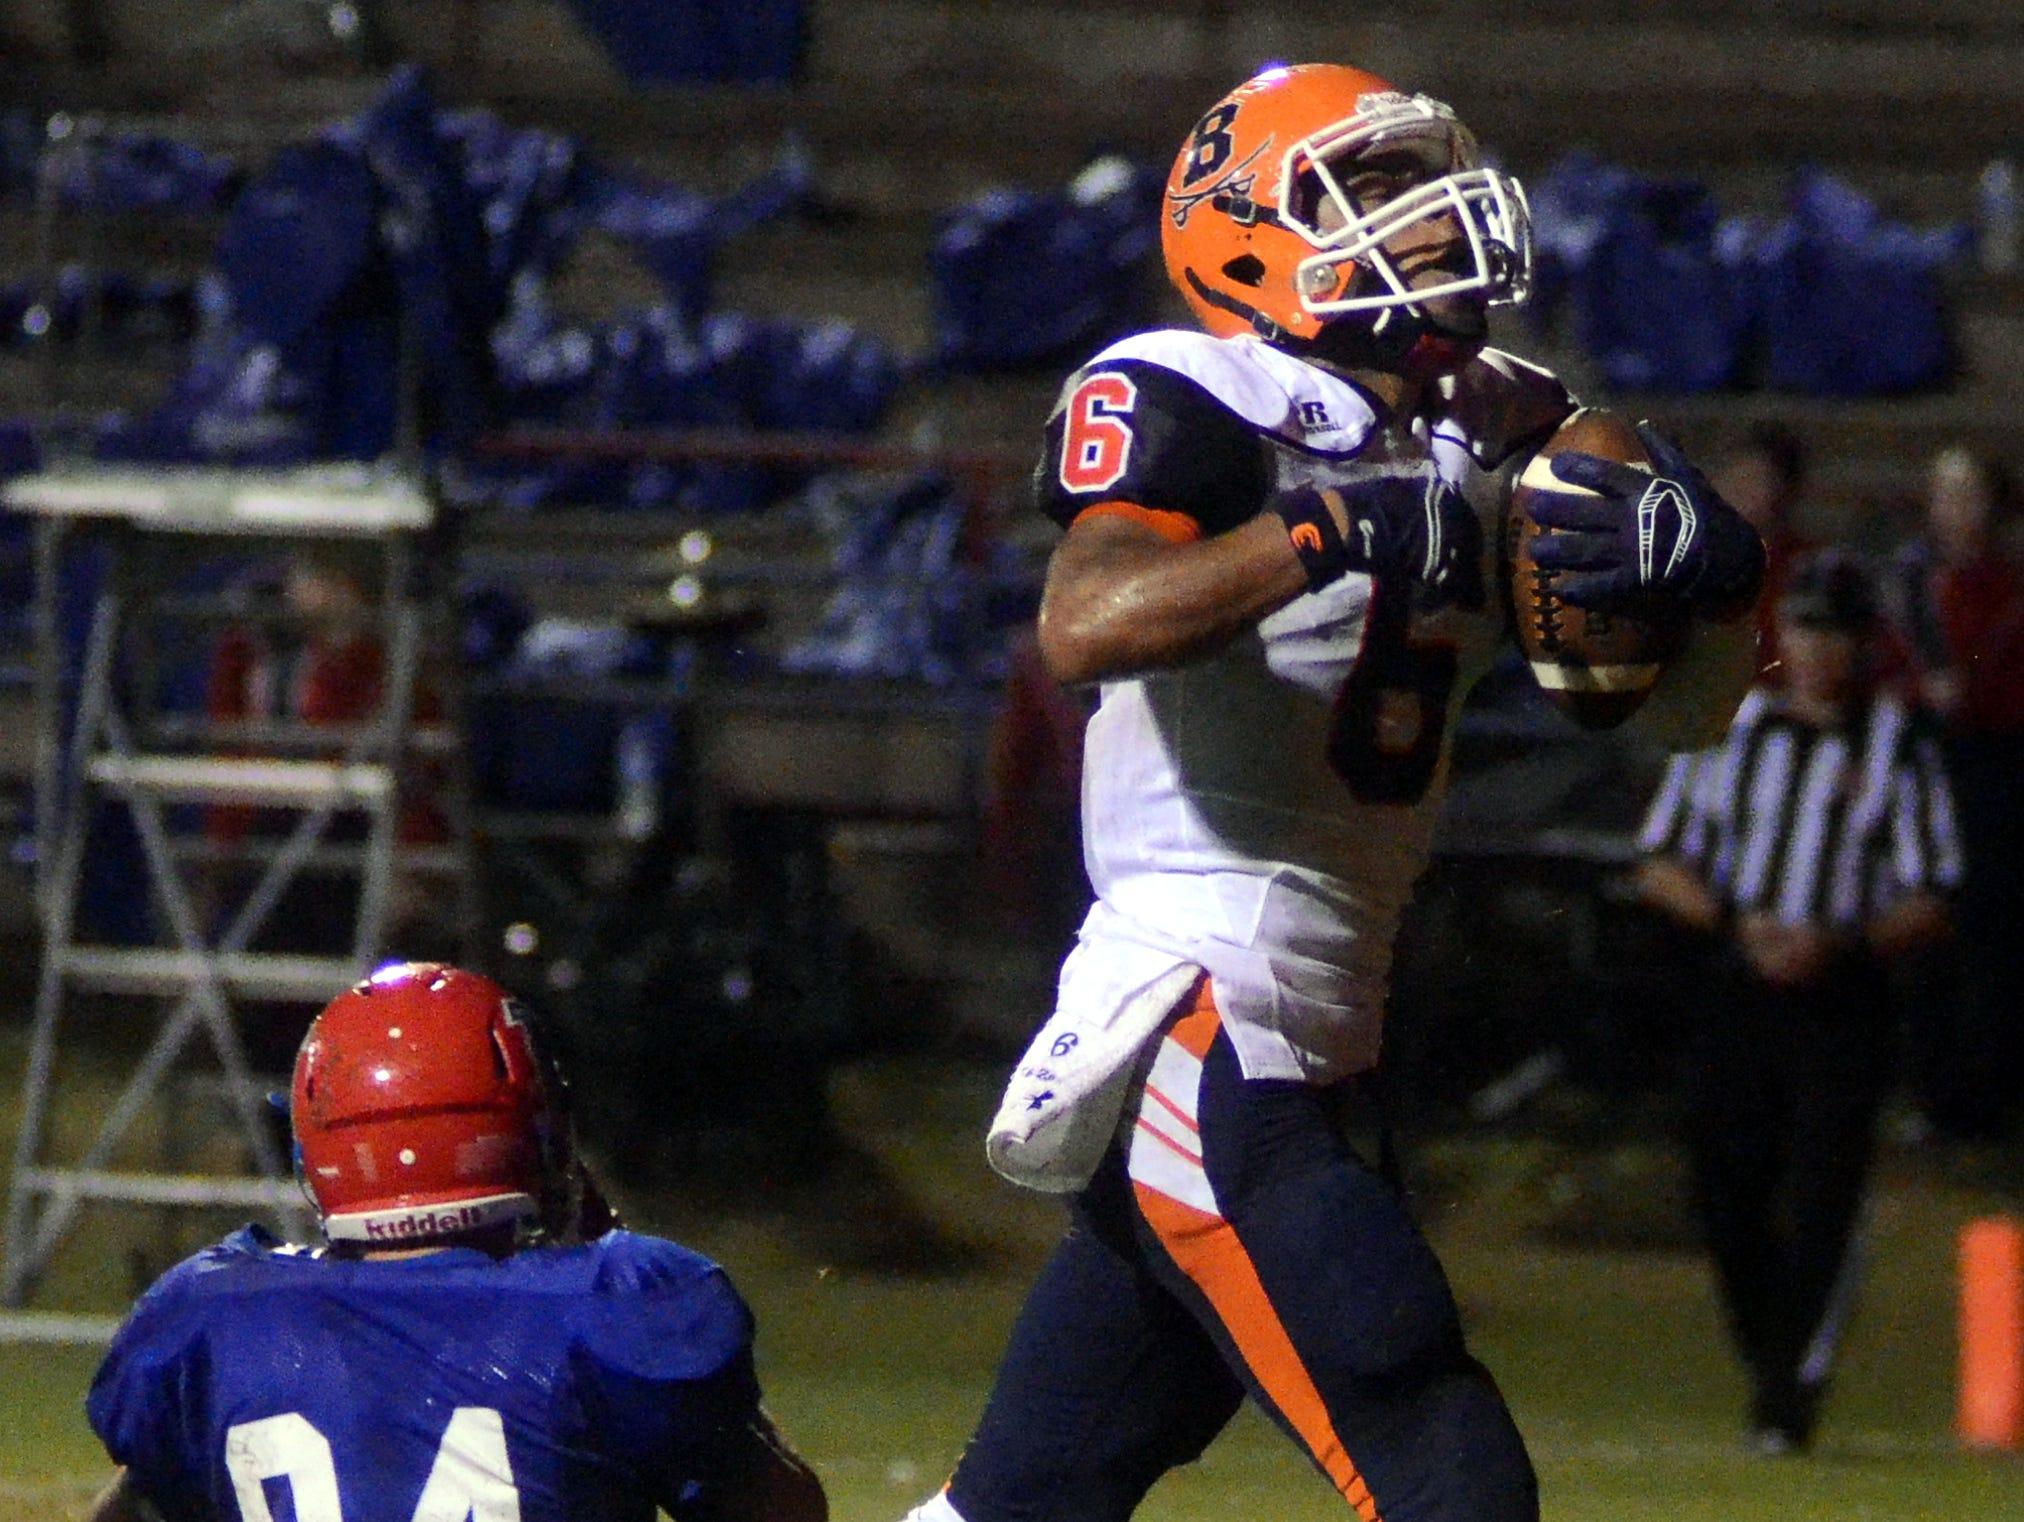 Beech junior Alex Vanzant celebrates after scoring a second-quarter touchdown at Lincoln County.